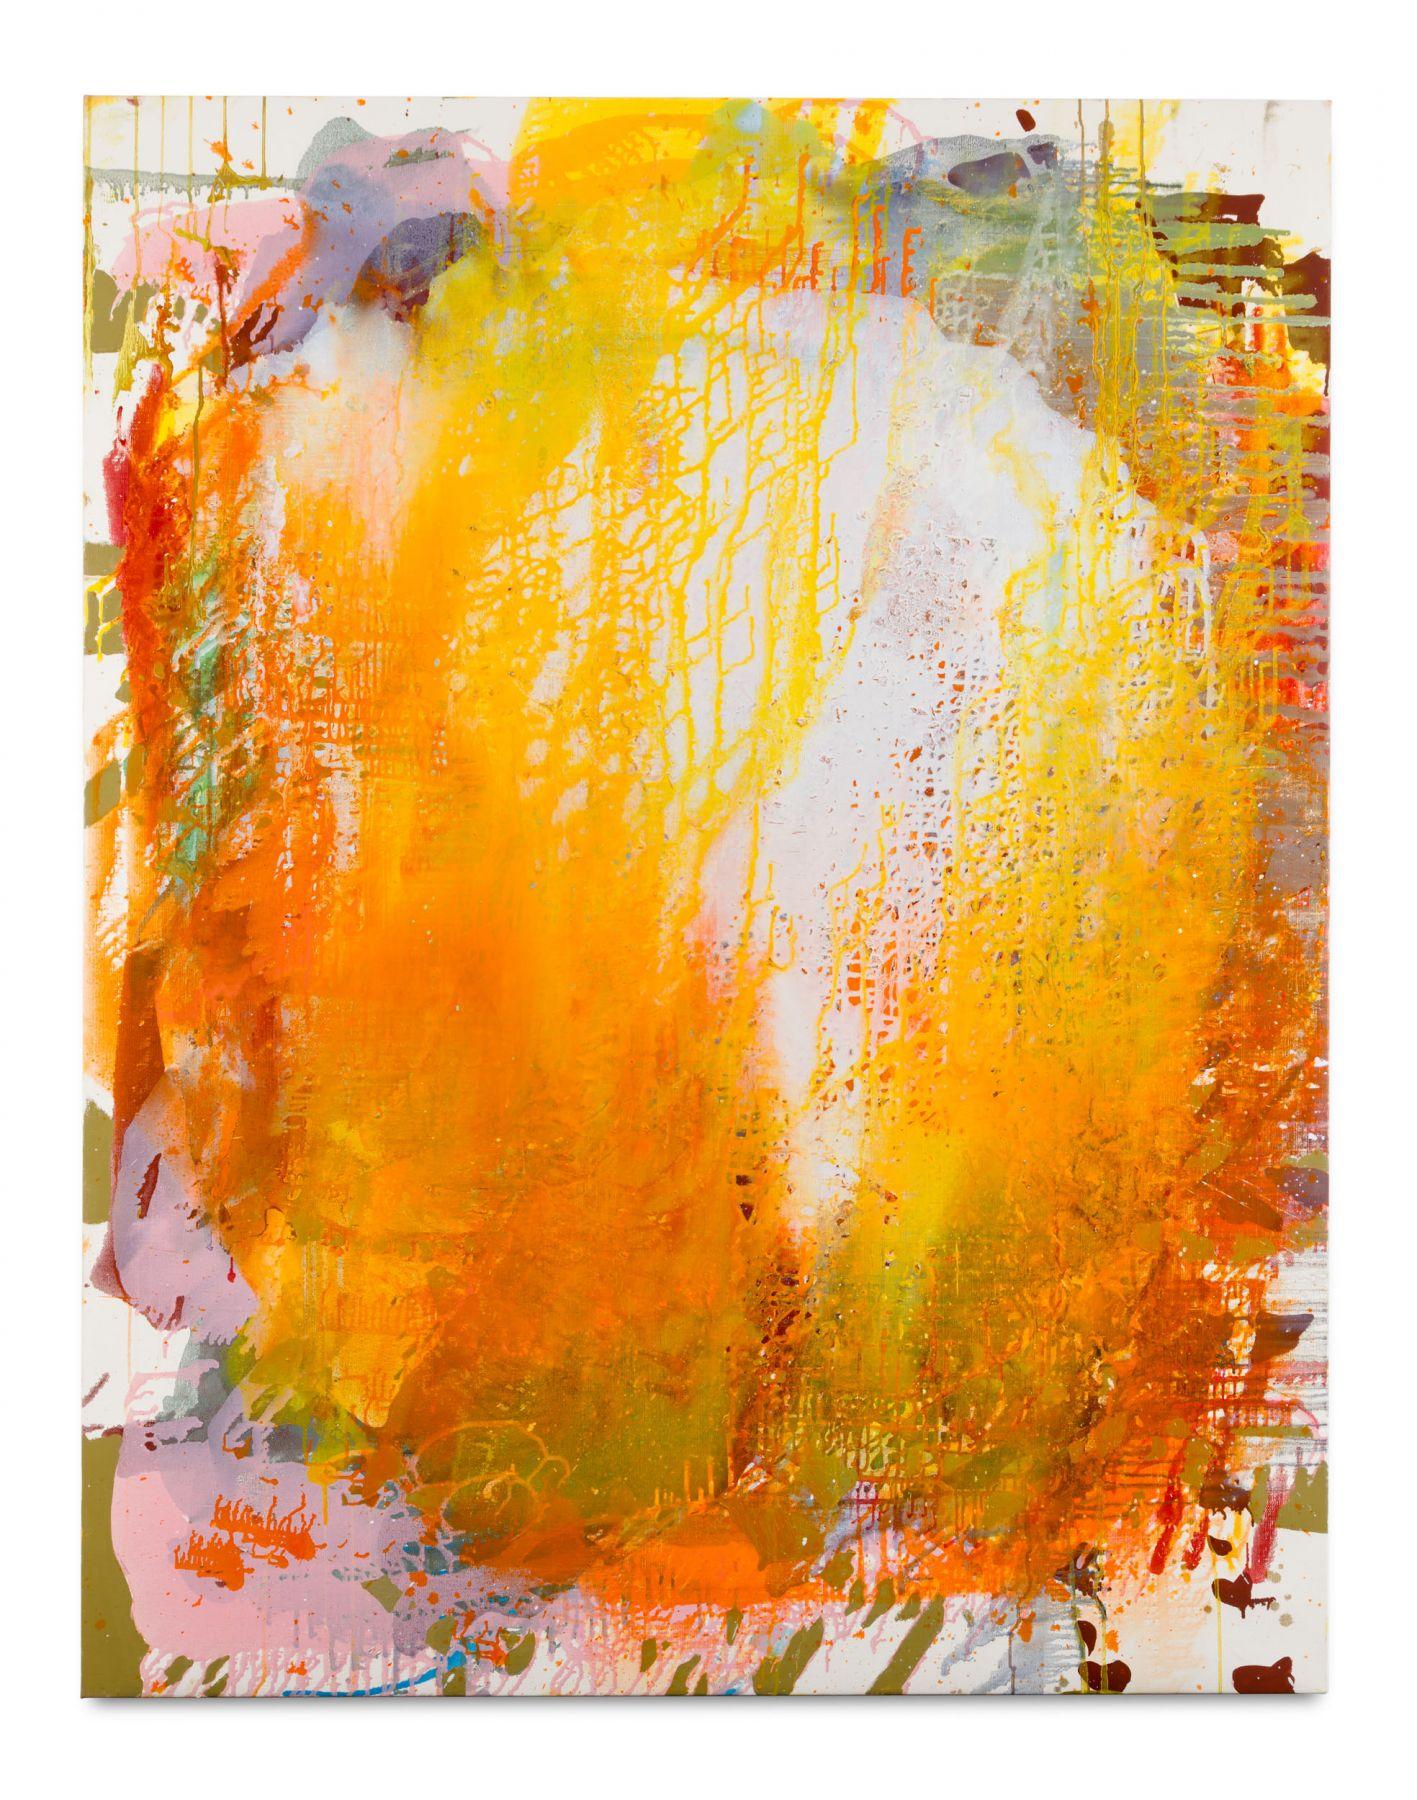 Portrait (Blast),2018 Oil and mica on linen